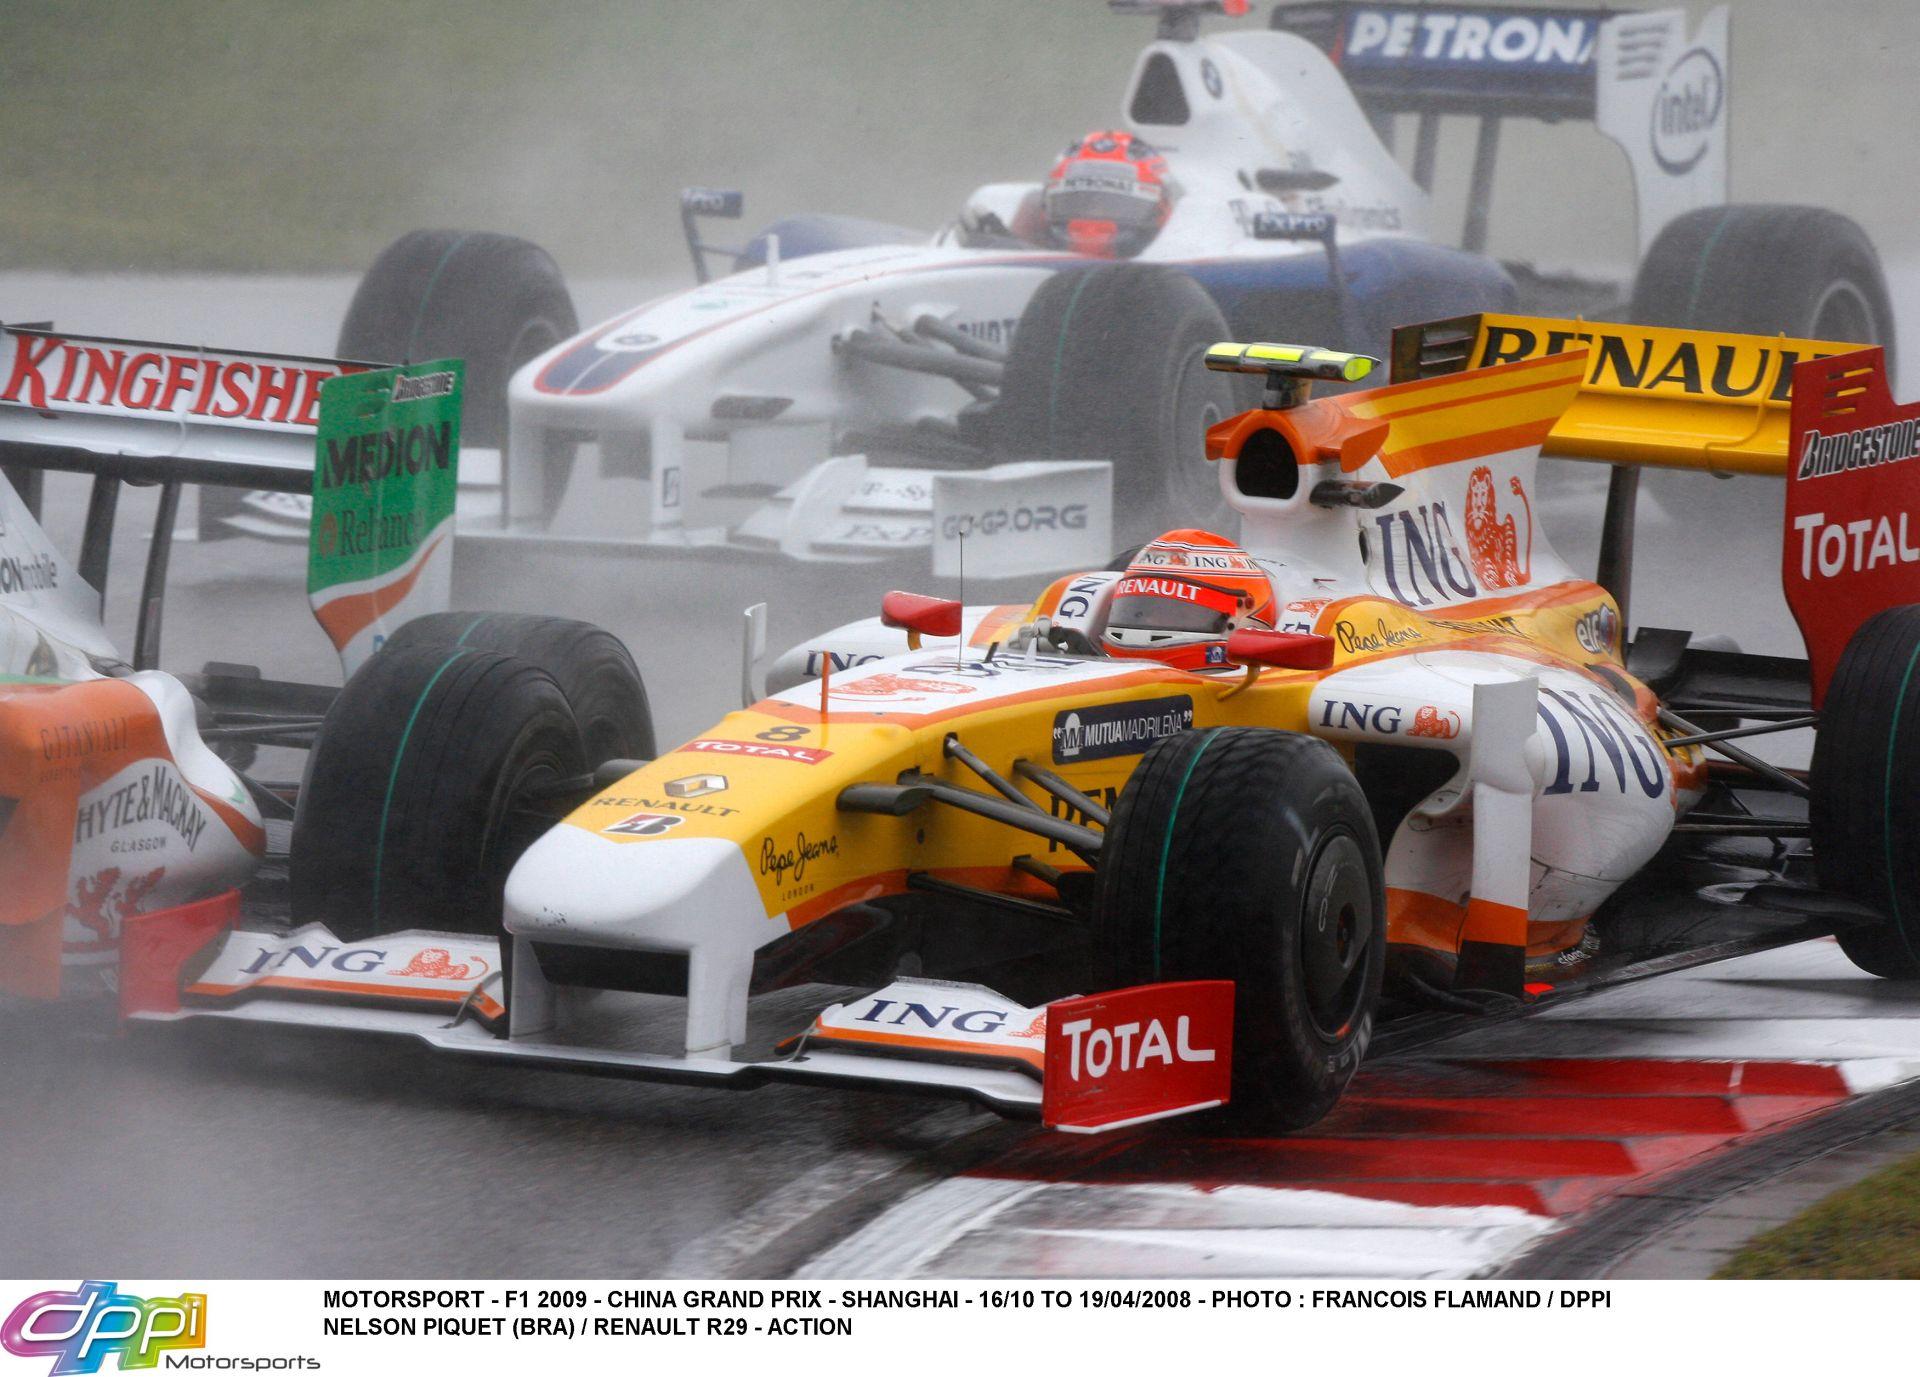 Ma 30 éves Nelsinho Piquet